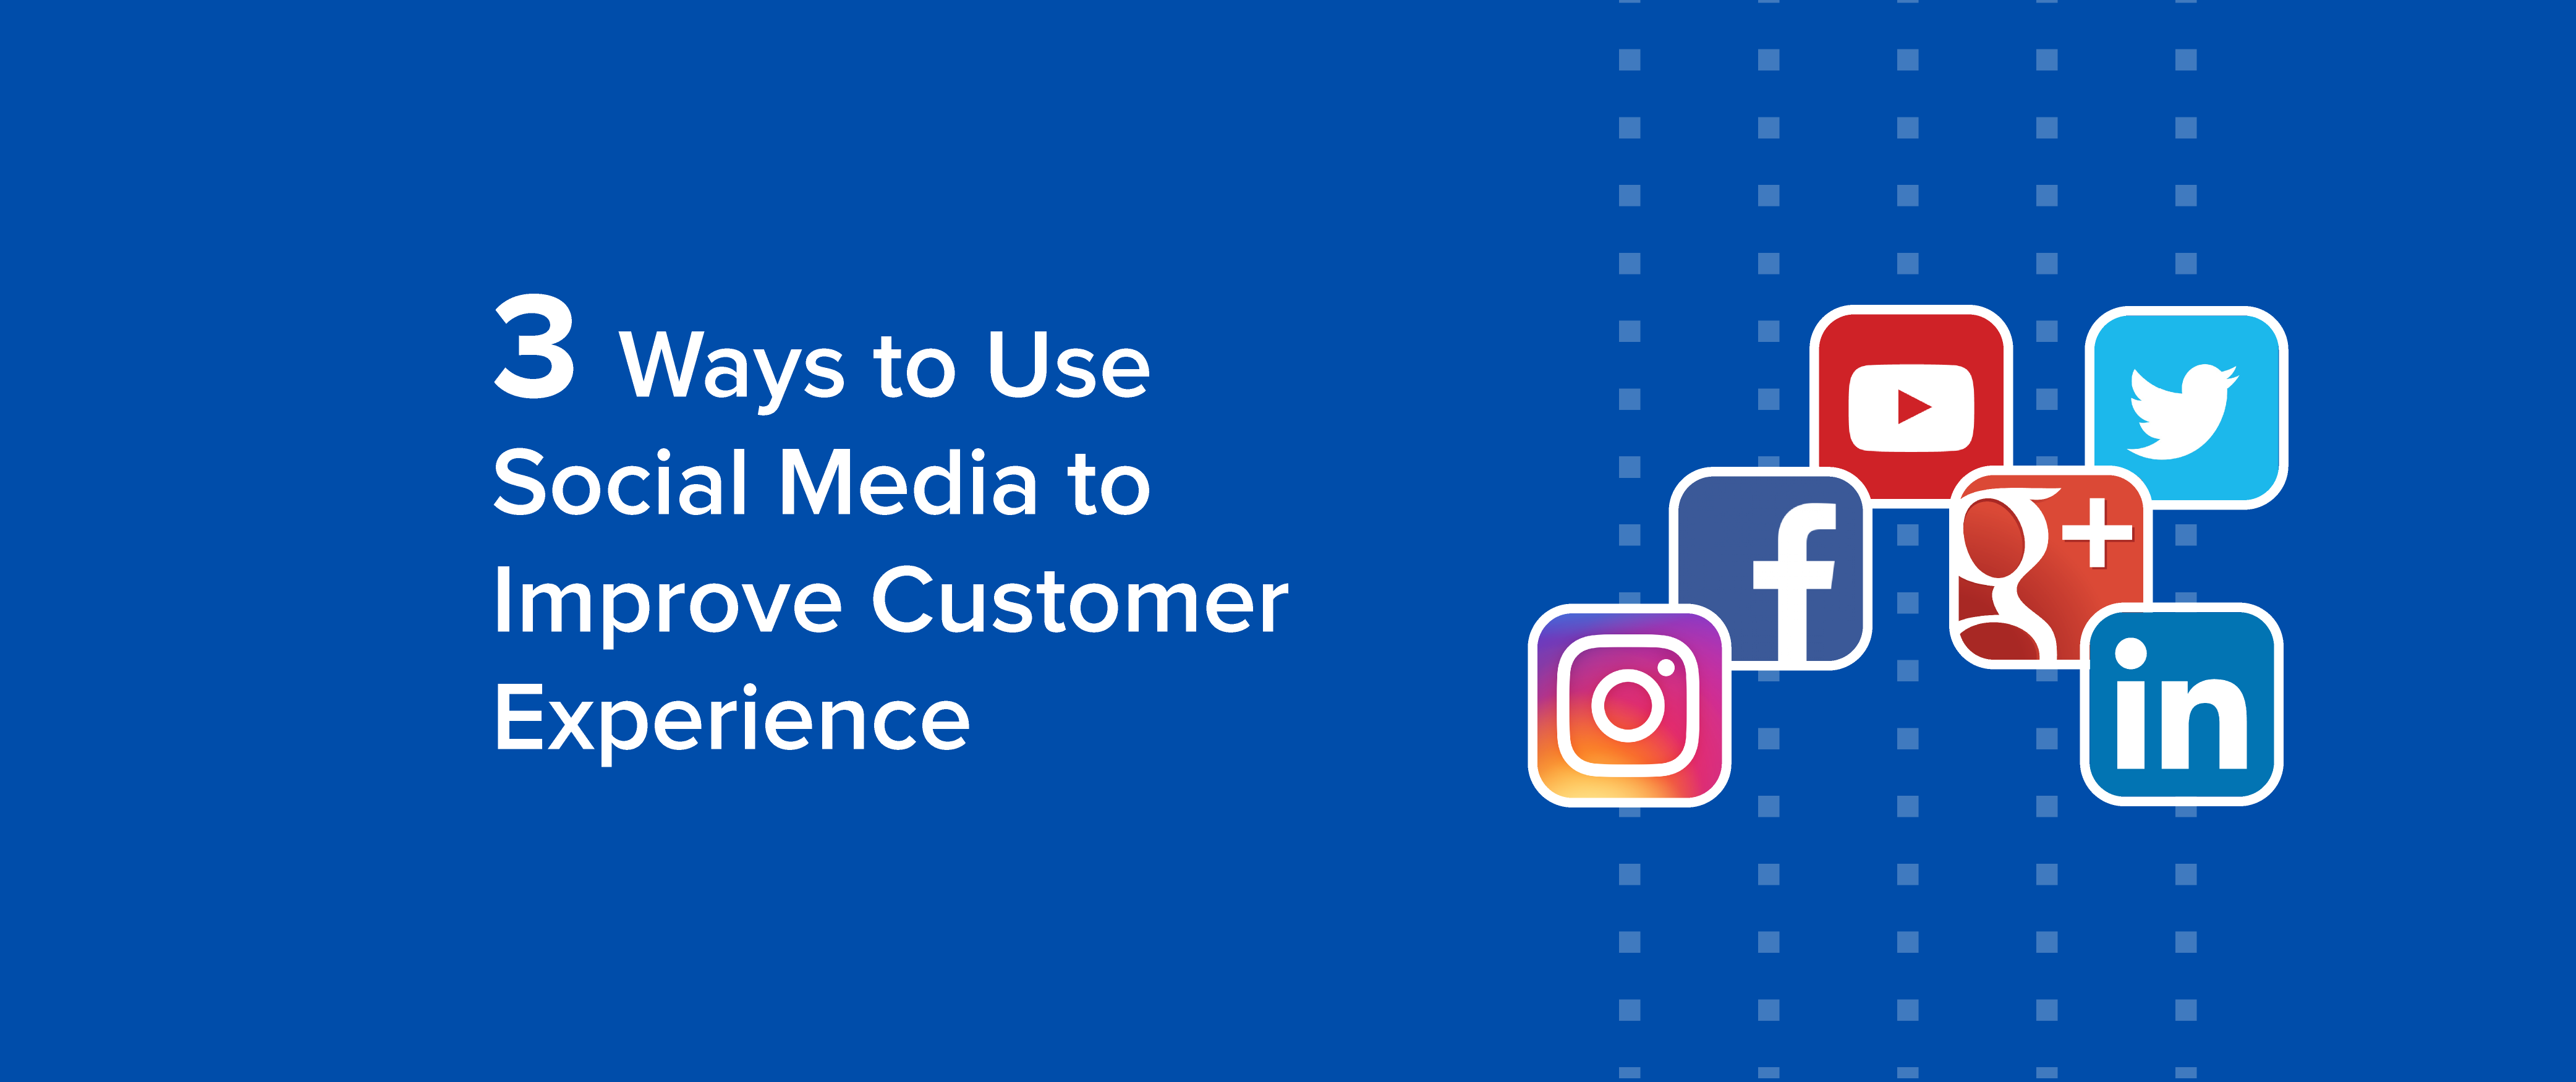 3 Ways to Use Social Media to Improve Customer Experience